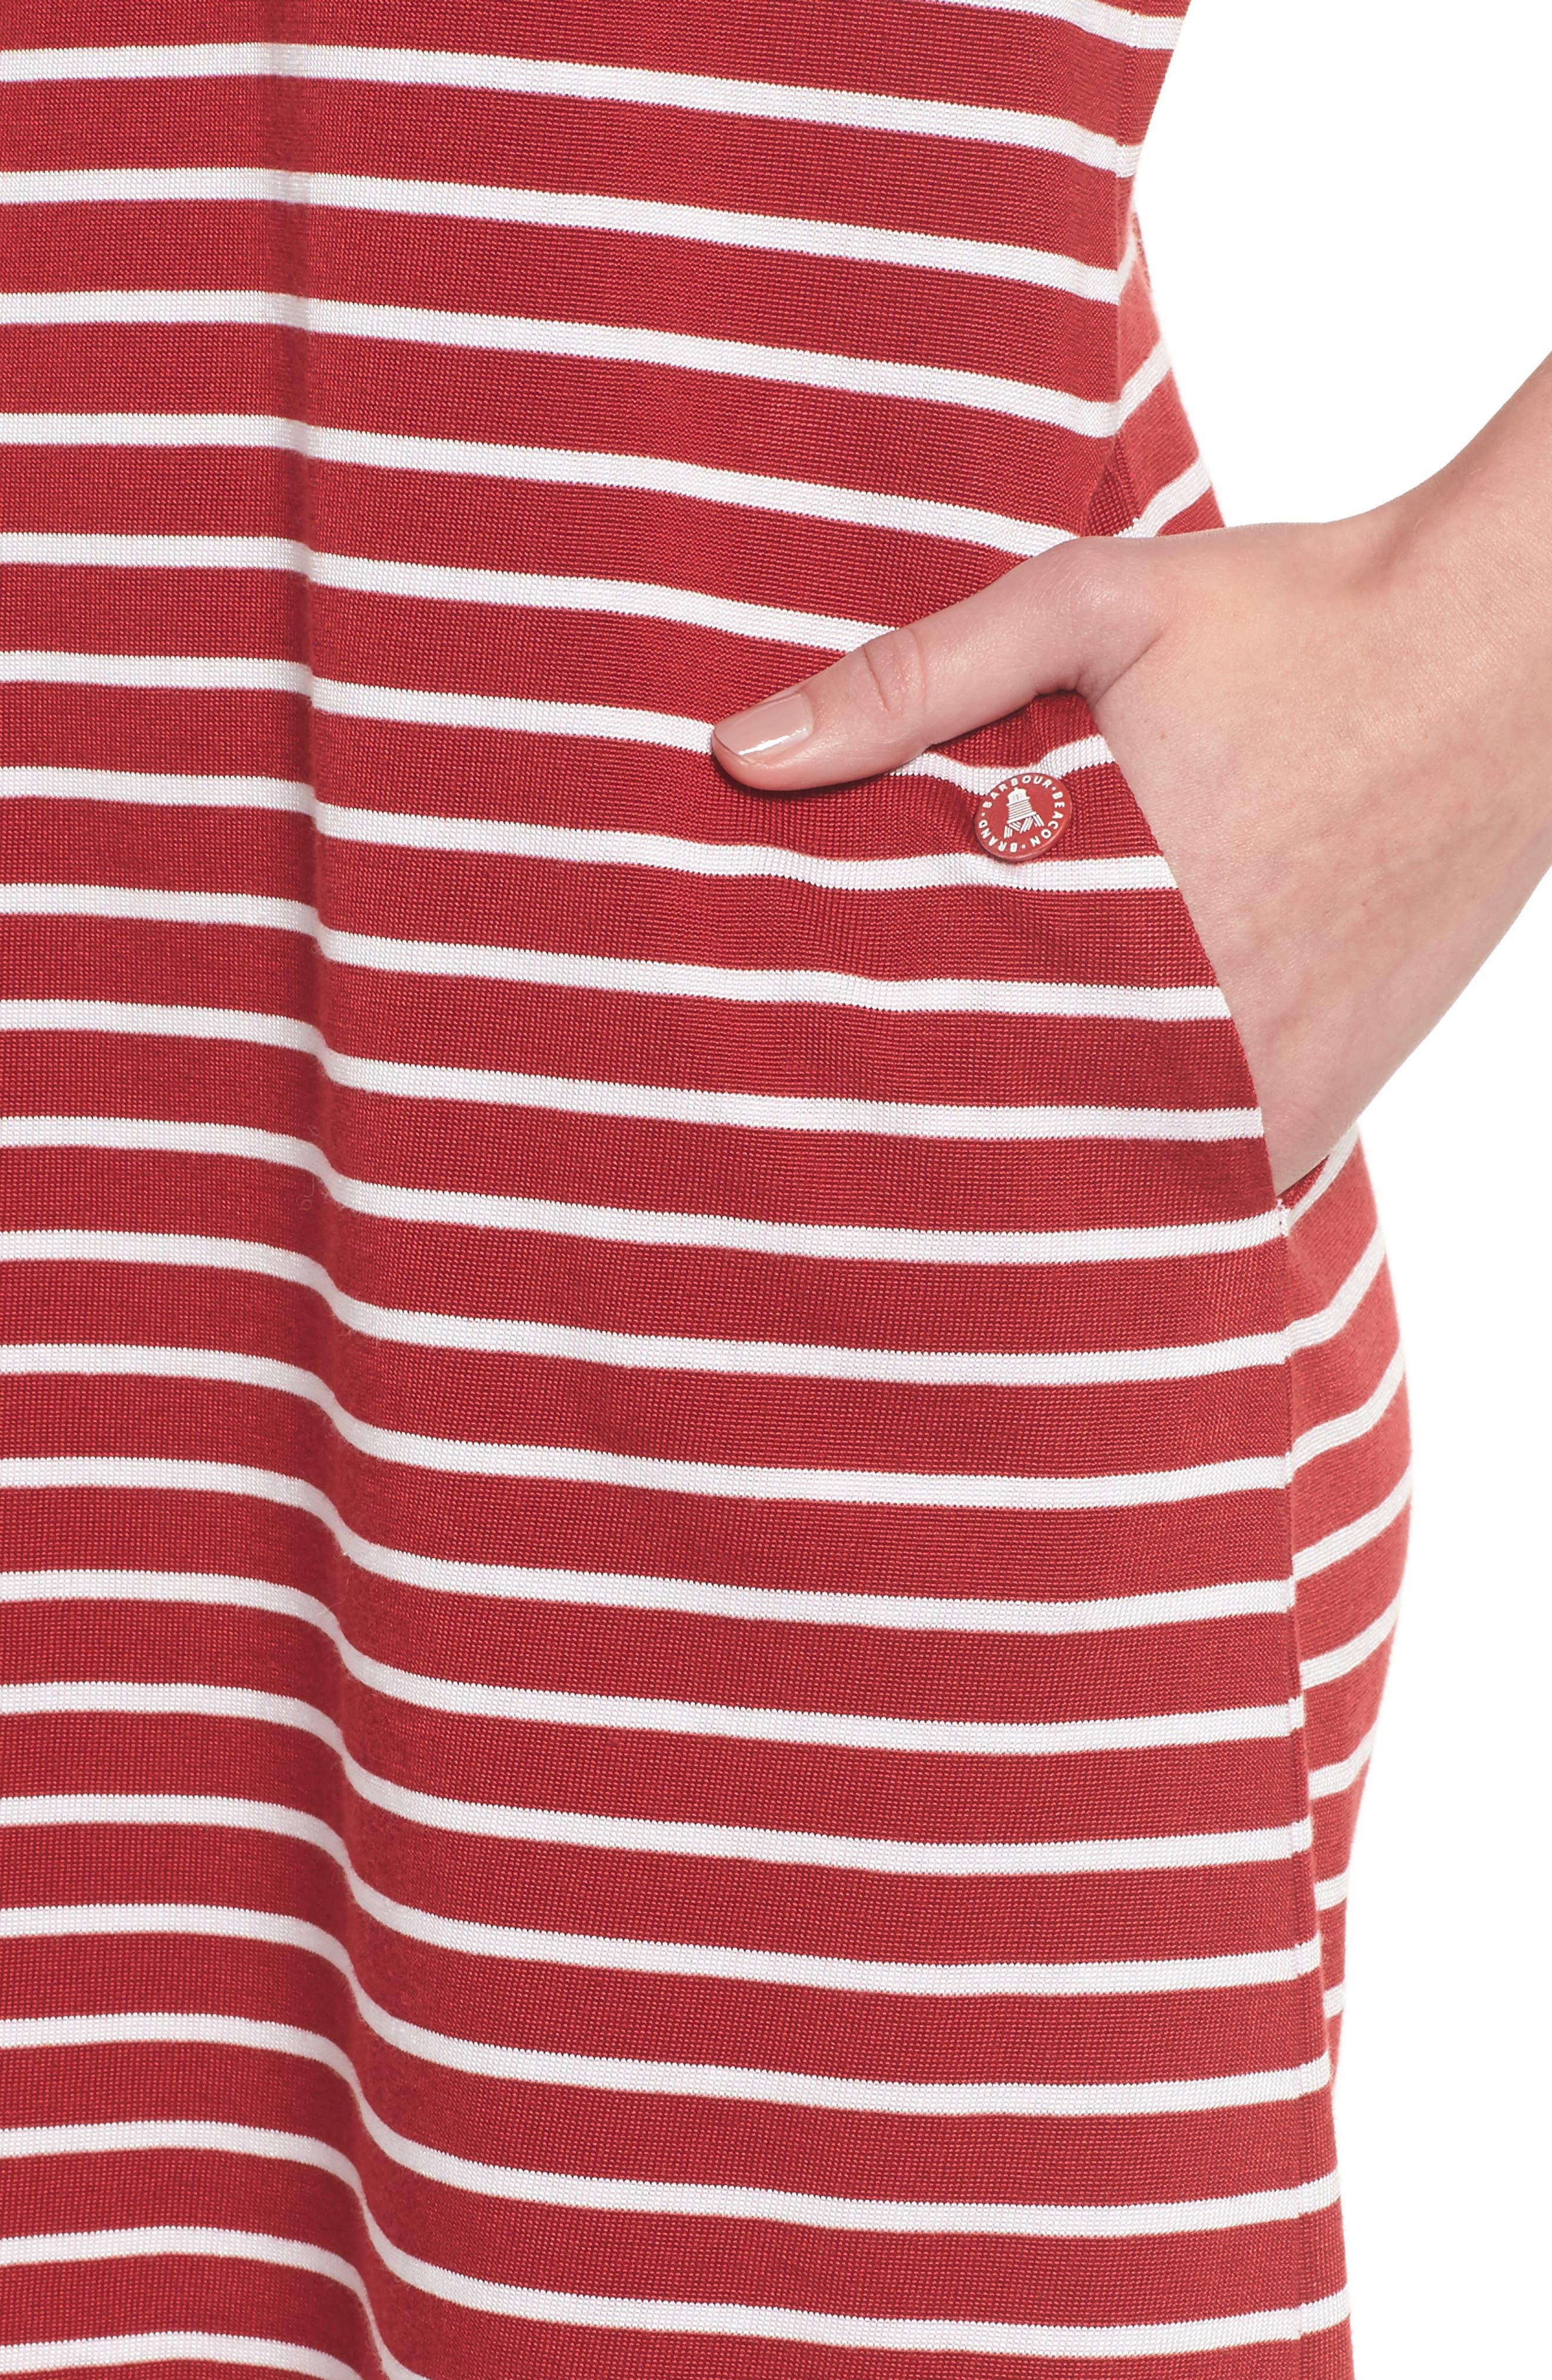 Dalmore Stripe Jersey Sleeveless Shift Dress,                             Alternate thumbnail 4, color,                             630